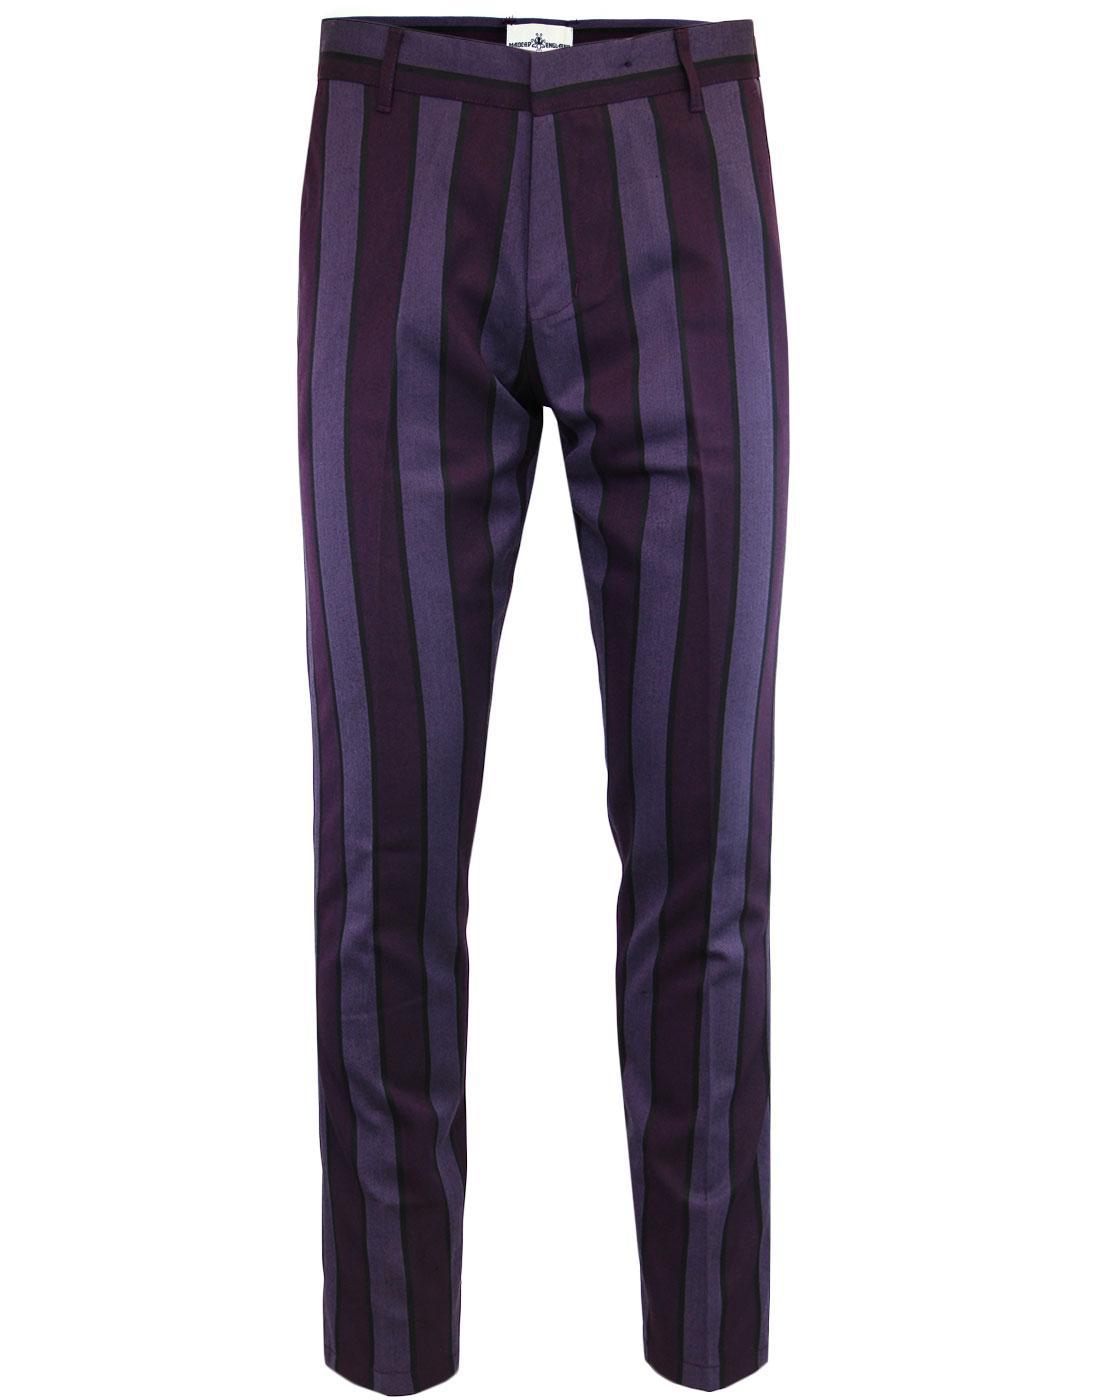 Speakeasy MADCAP ENGLAND Mod Slim Stripe Trousers